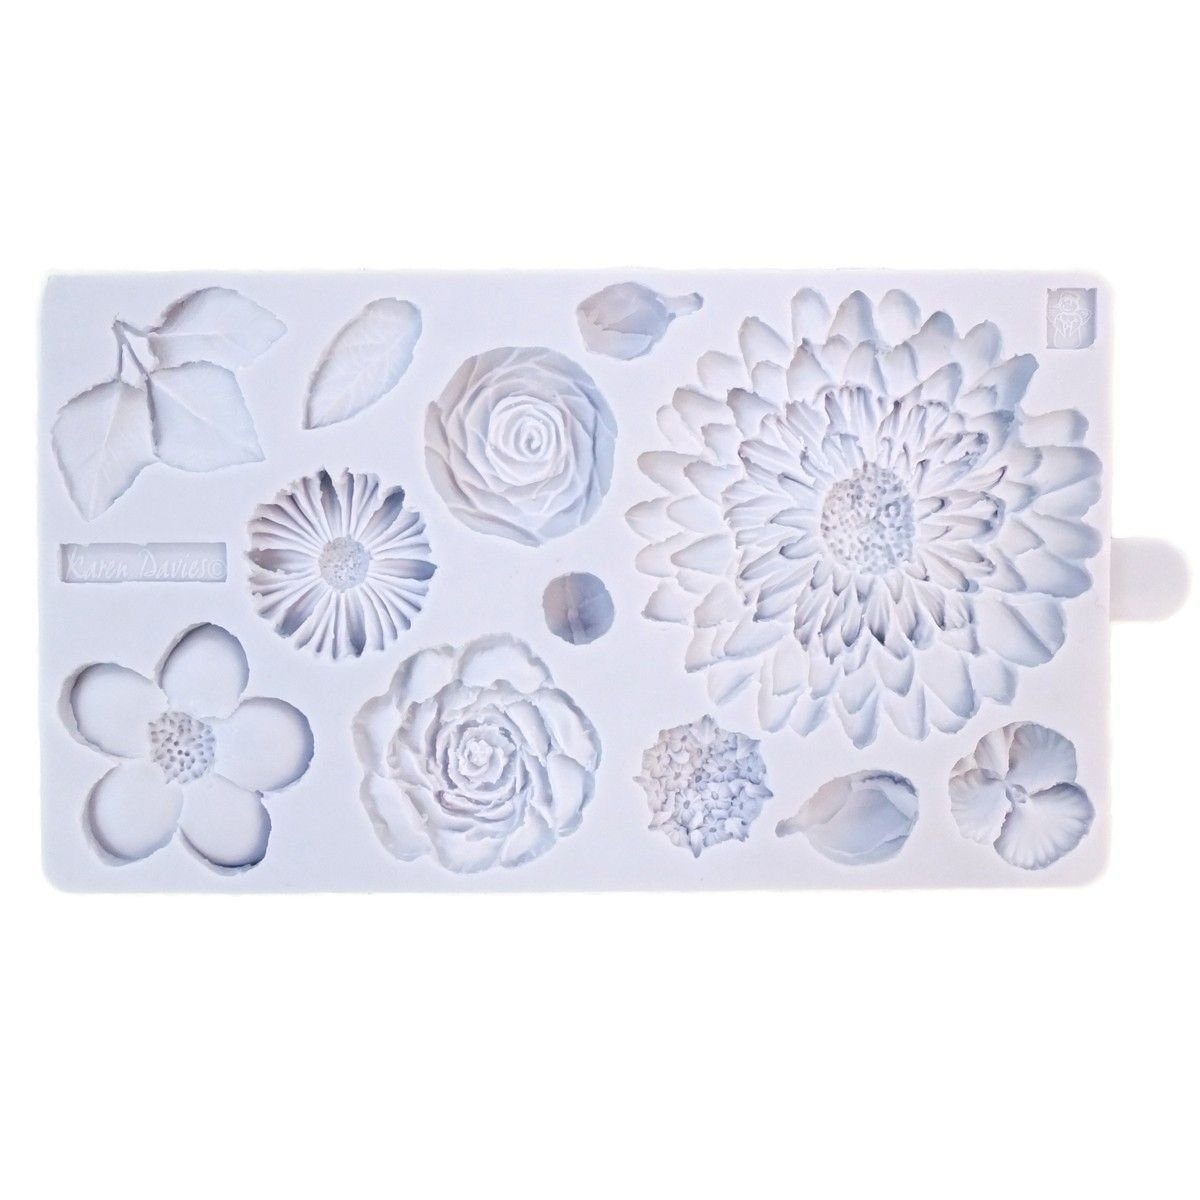 Karen Davies - Silicone Mould Buttercream Flowers - Καλούπι Λουλούδια Βουτυρόκρεμας - Περίπου 21x12εκ